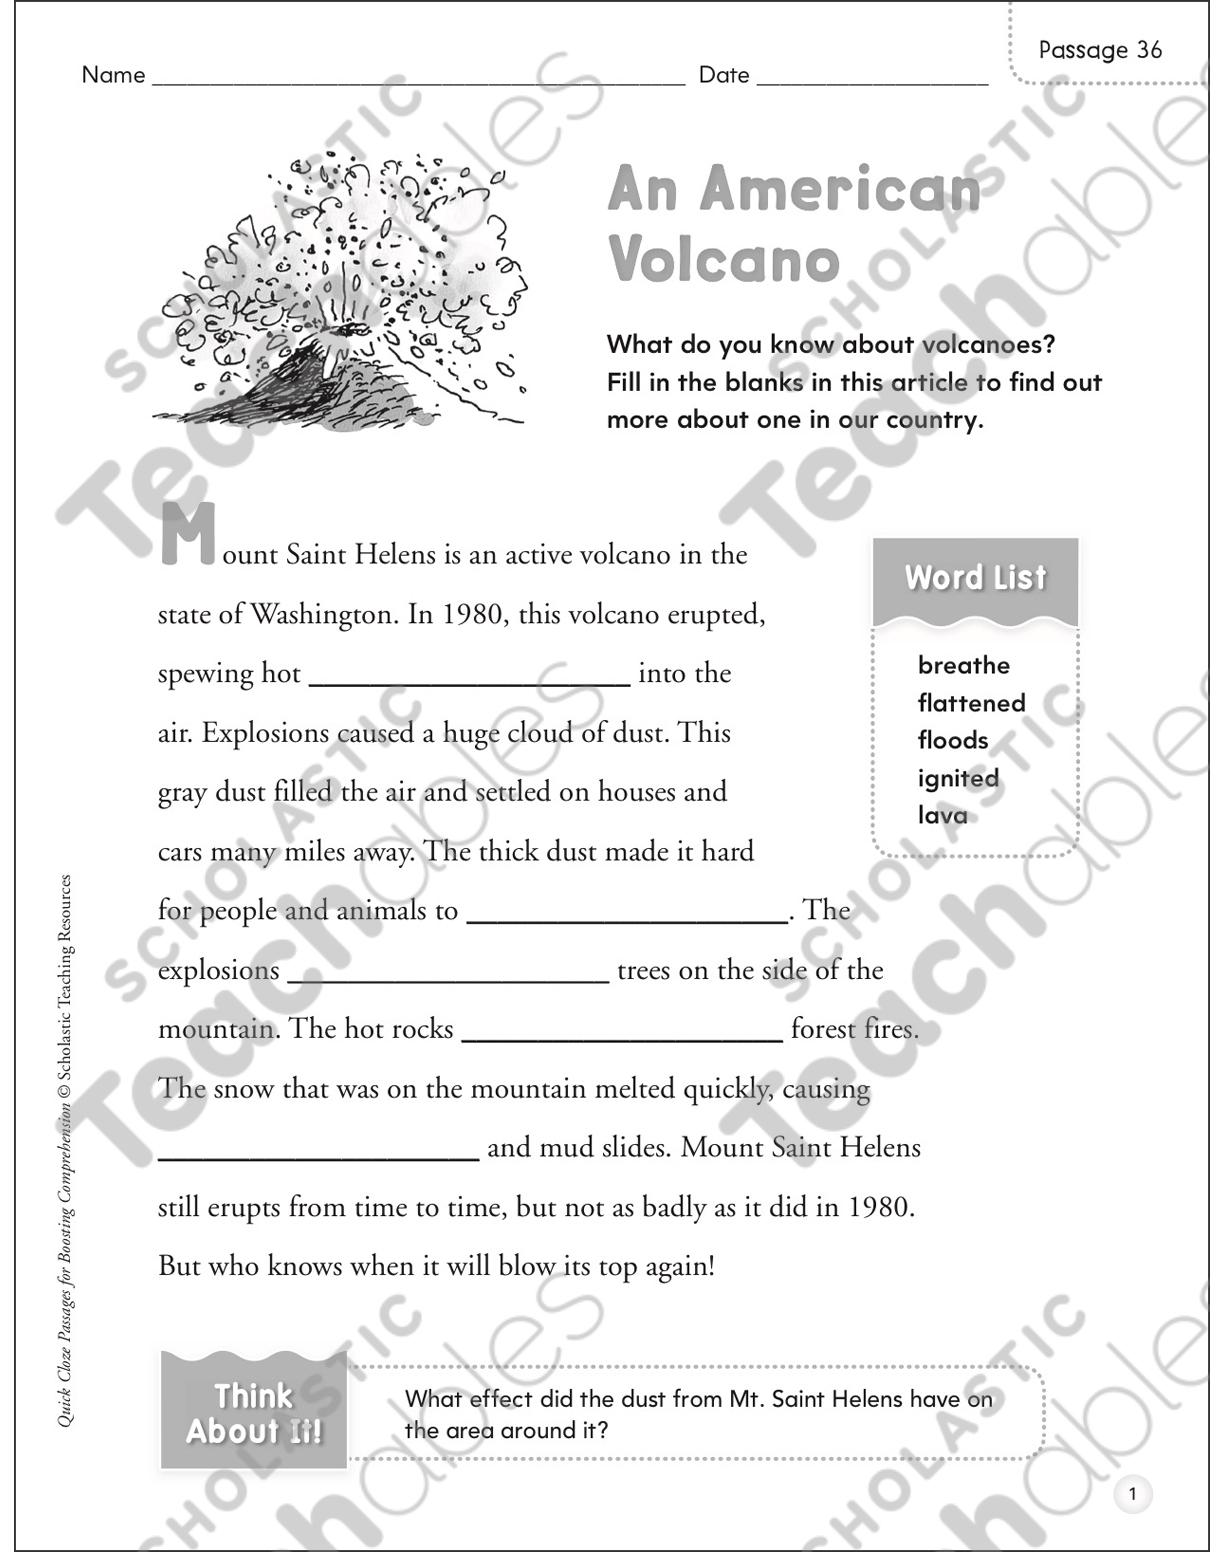 An American Volcano Quick Cloze Passage Printable Skills Sheets